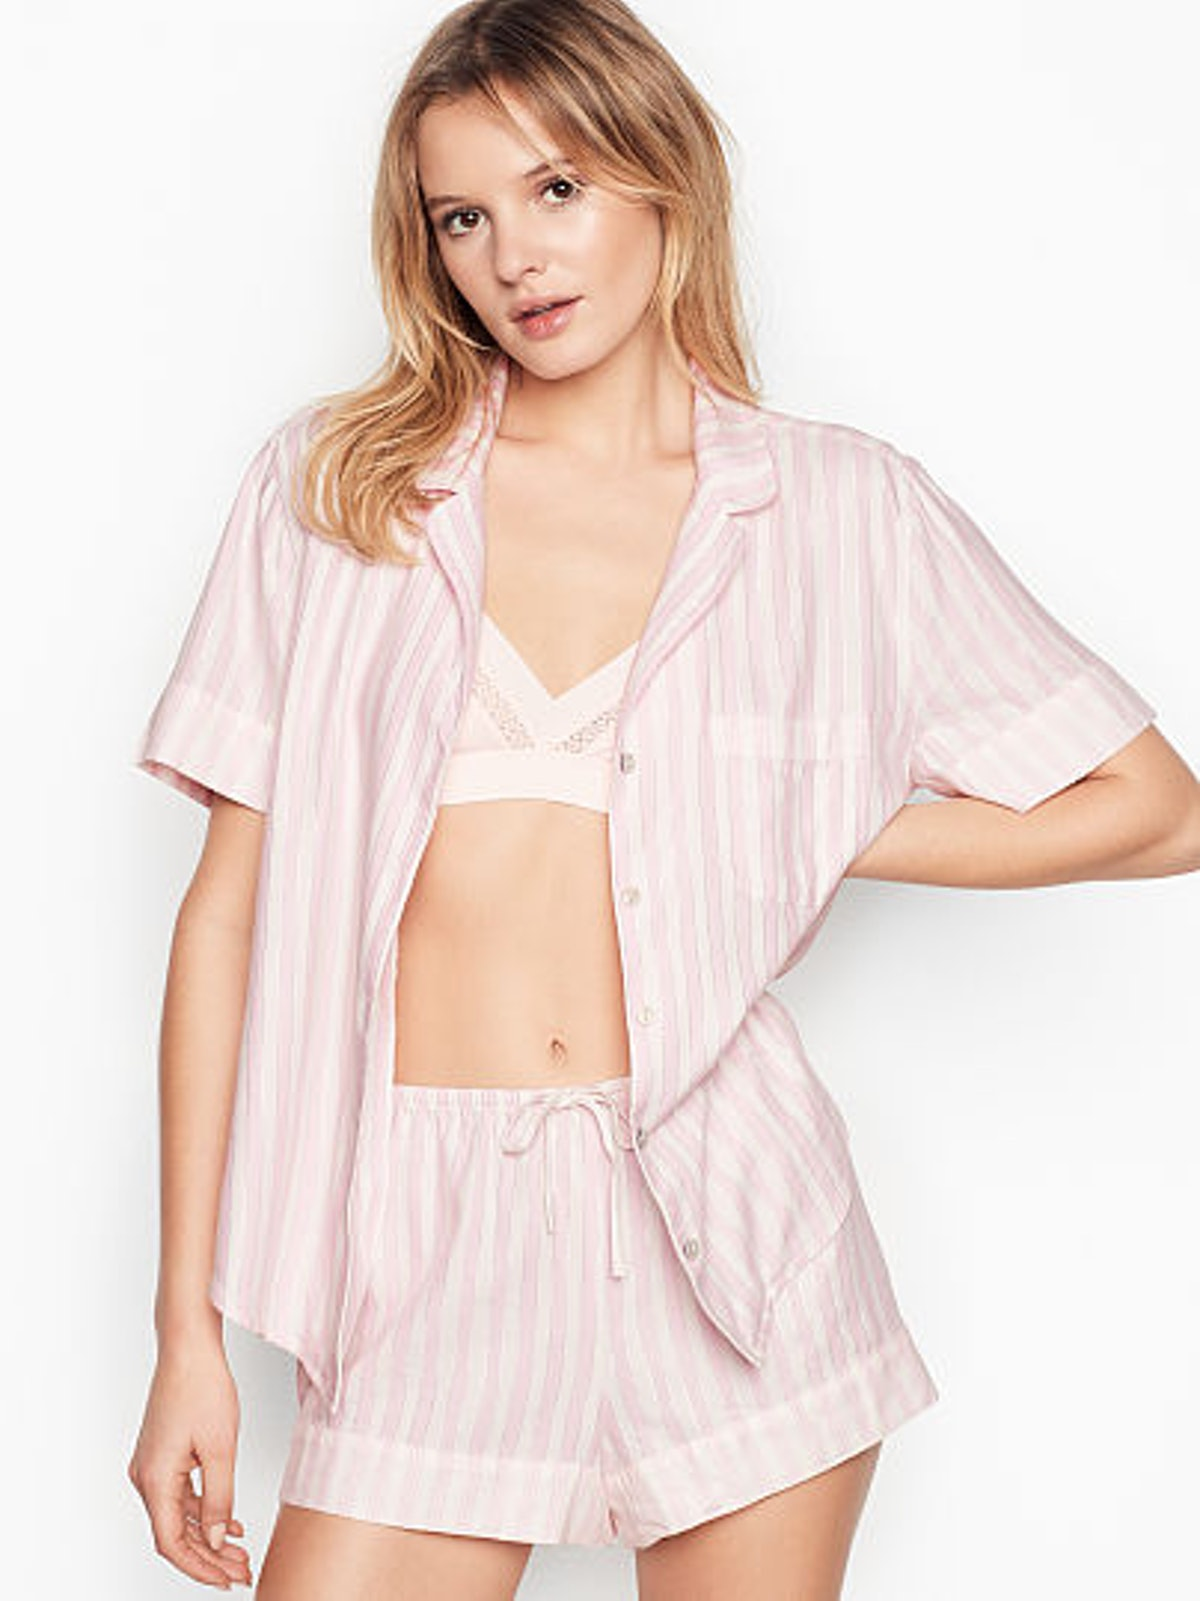 Flannel Short PJ Set in Pink/White Stripe